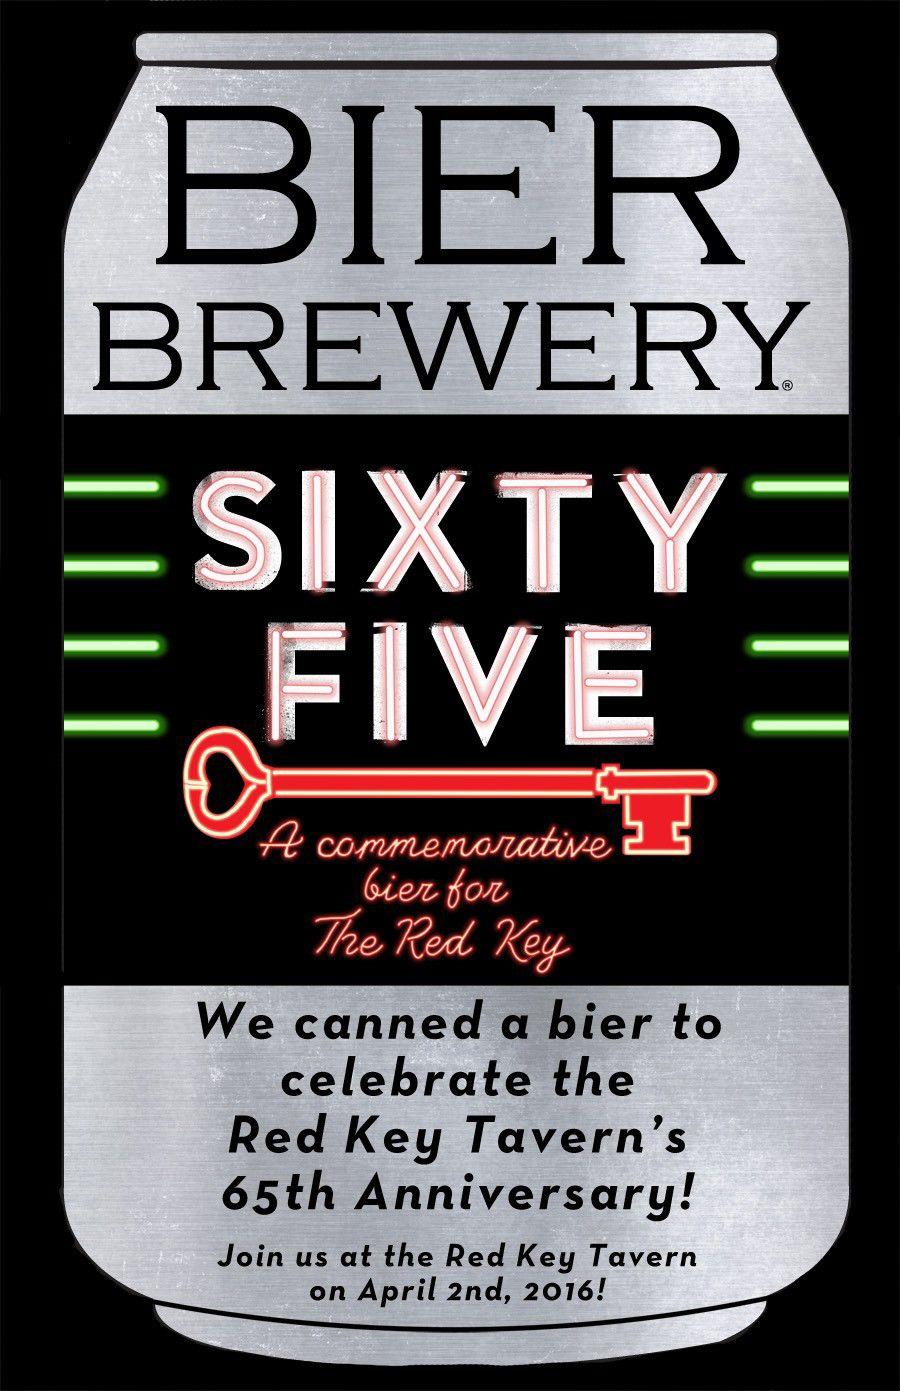 The Red Key Tavern turns 65